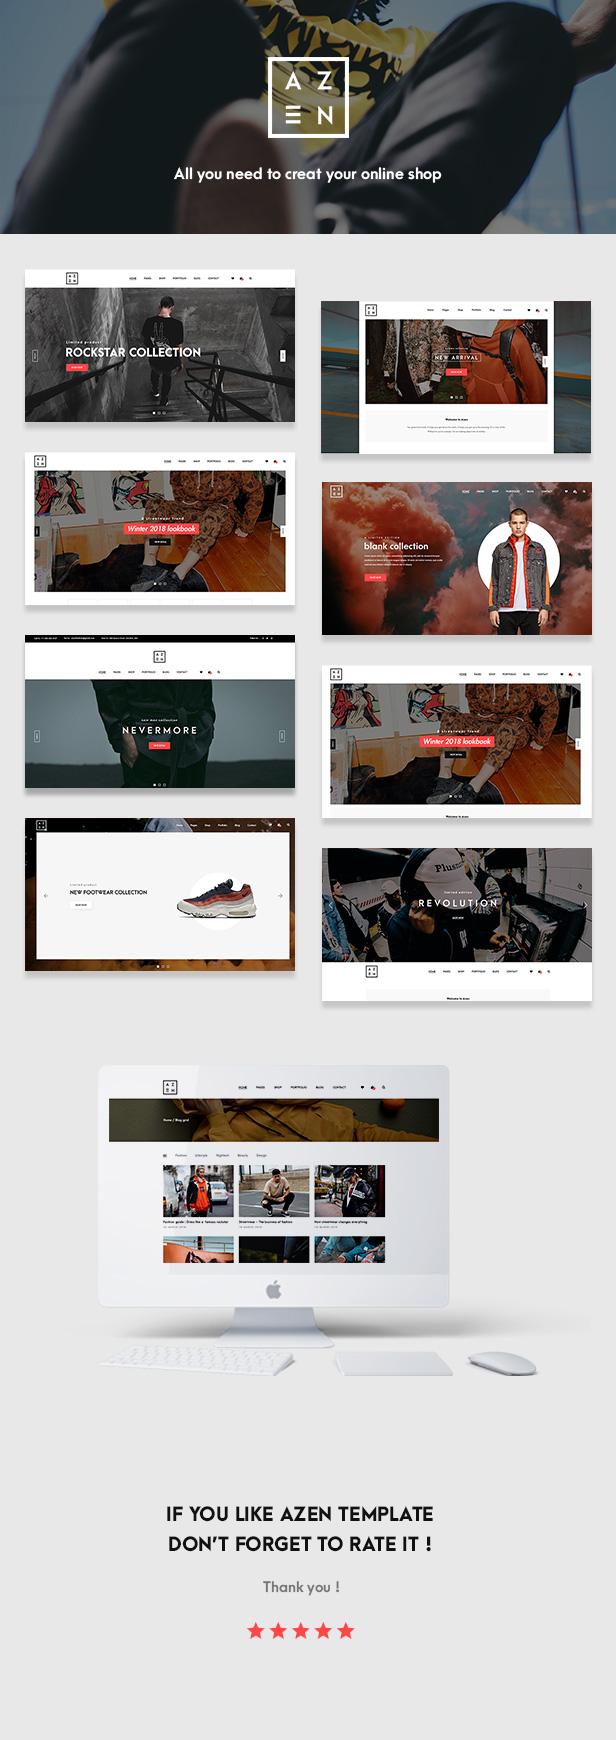 Azen - Clean, Minimal Shop HTML5 Template - 1